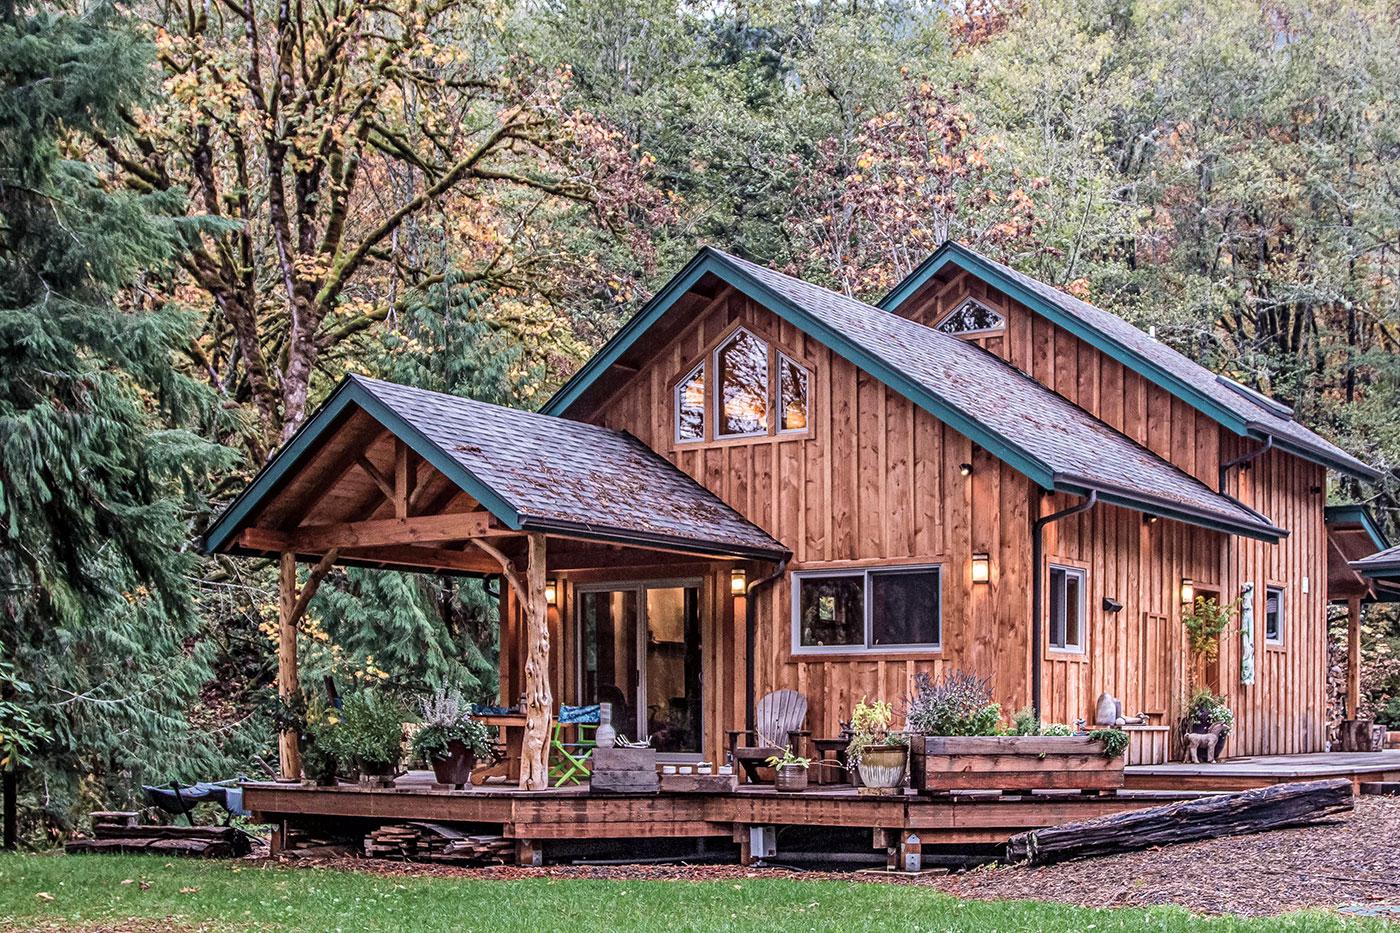 Scott McClure's Timber Cabin   The Shelter Blog